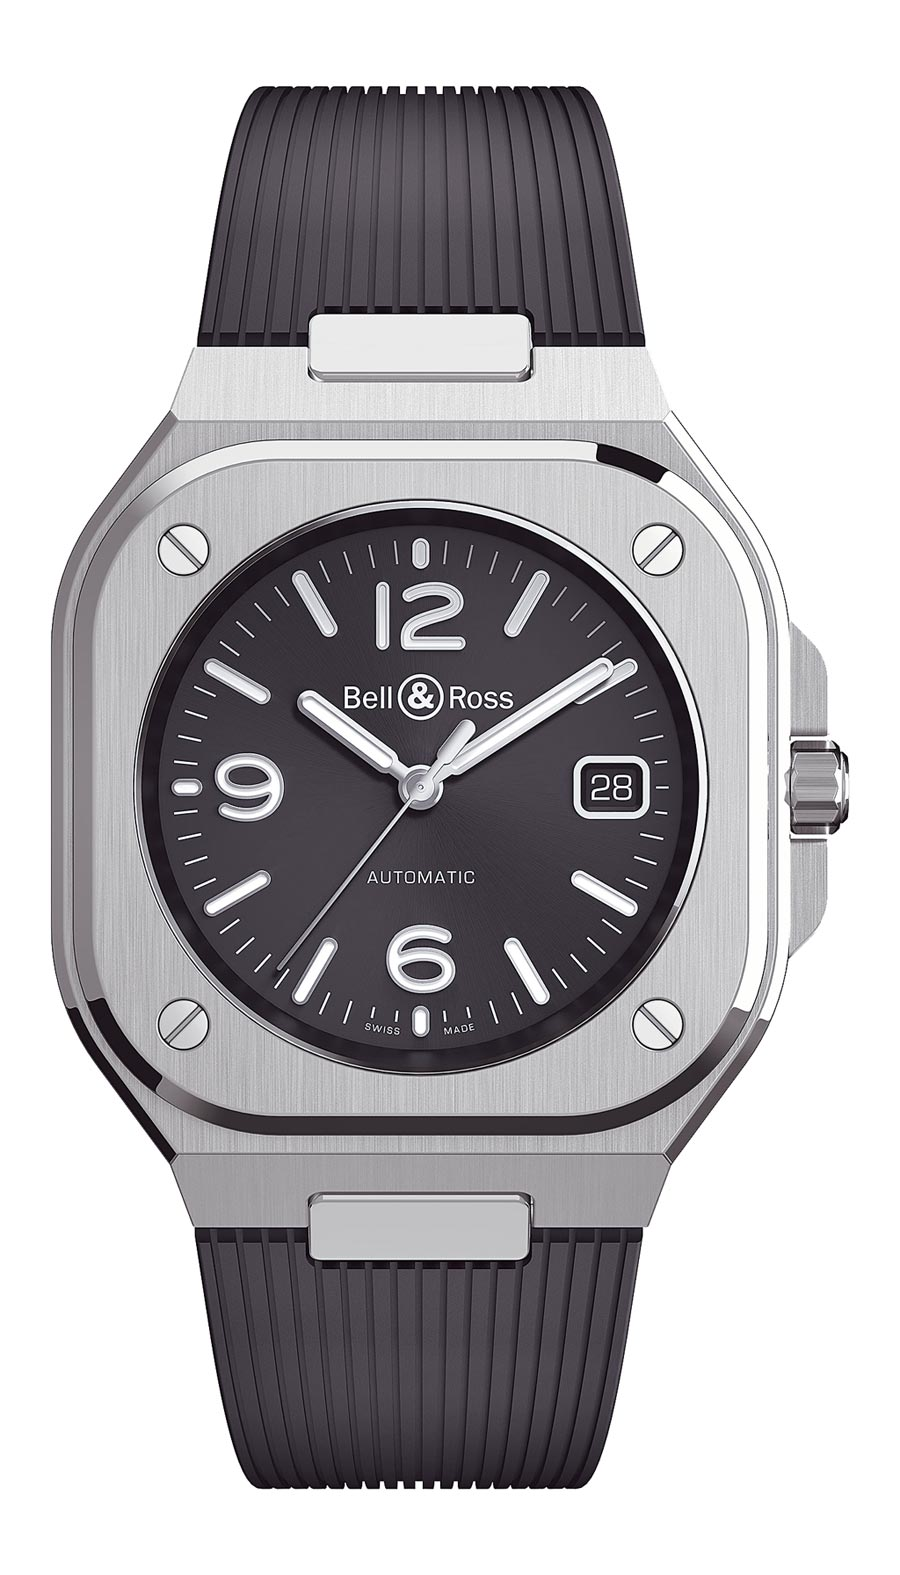 Bell & Ross年度力作BR05不鏽鋼腕表,14萬9000元。(Bell & Ross提供)